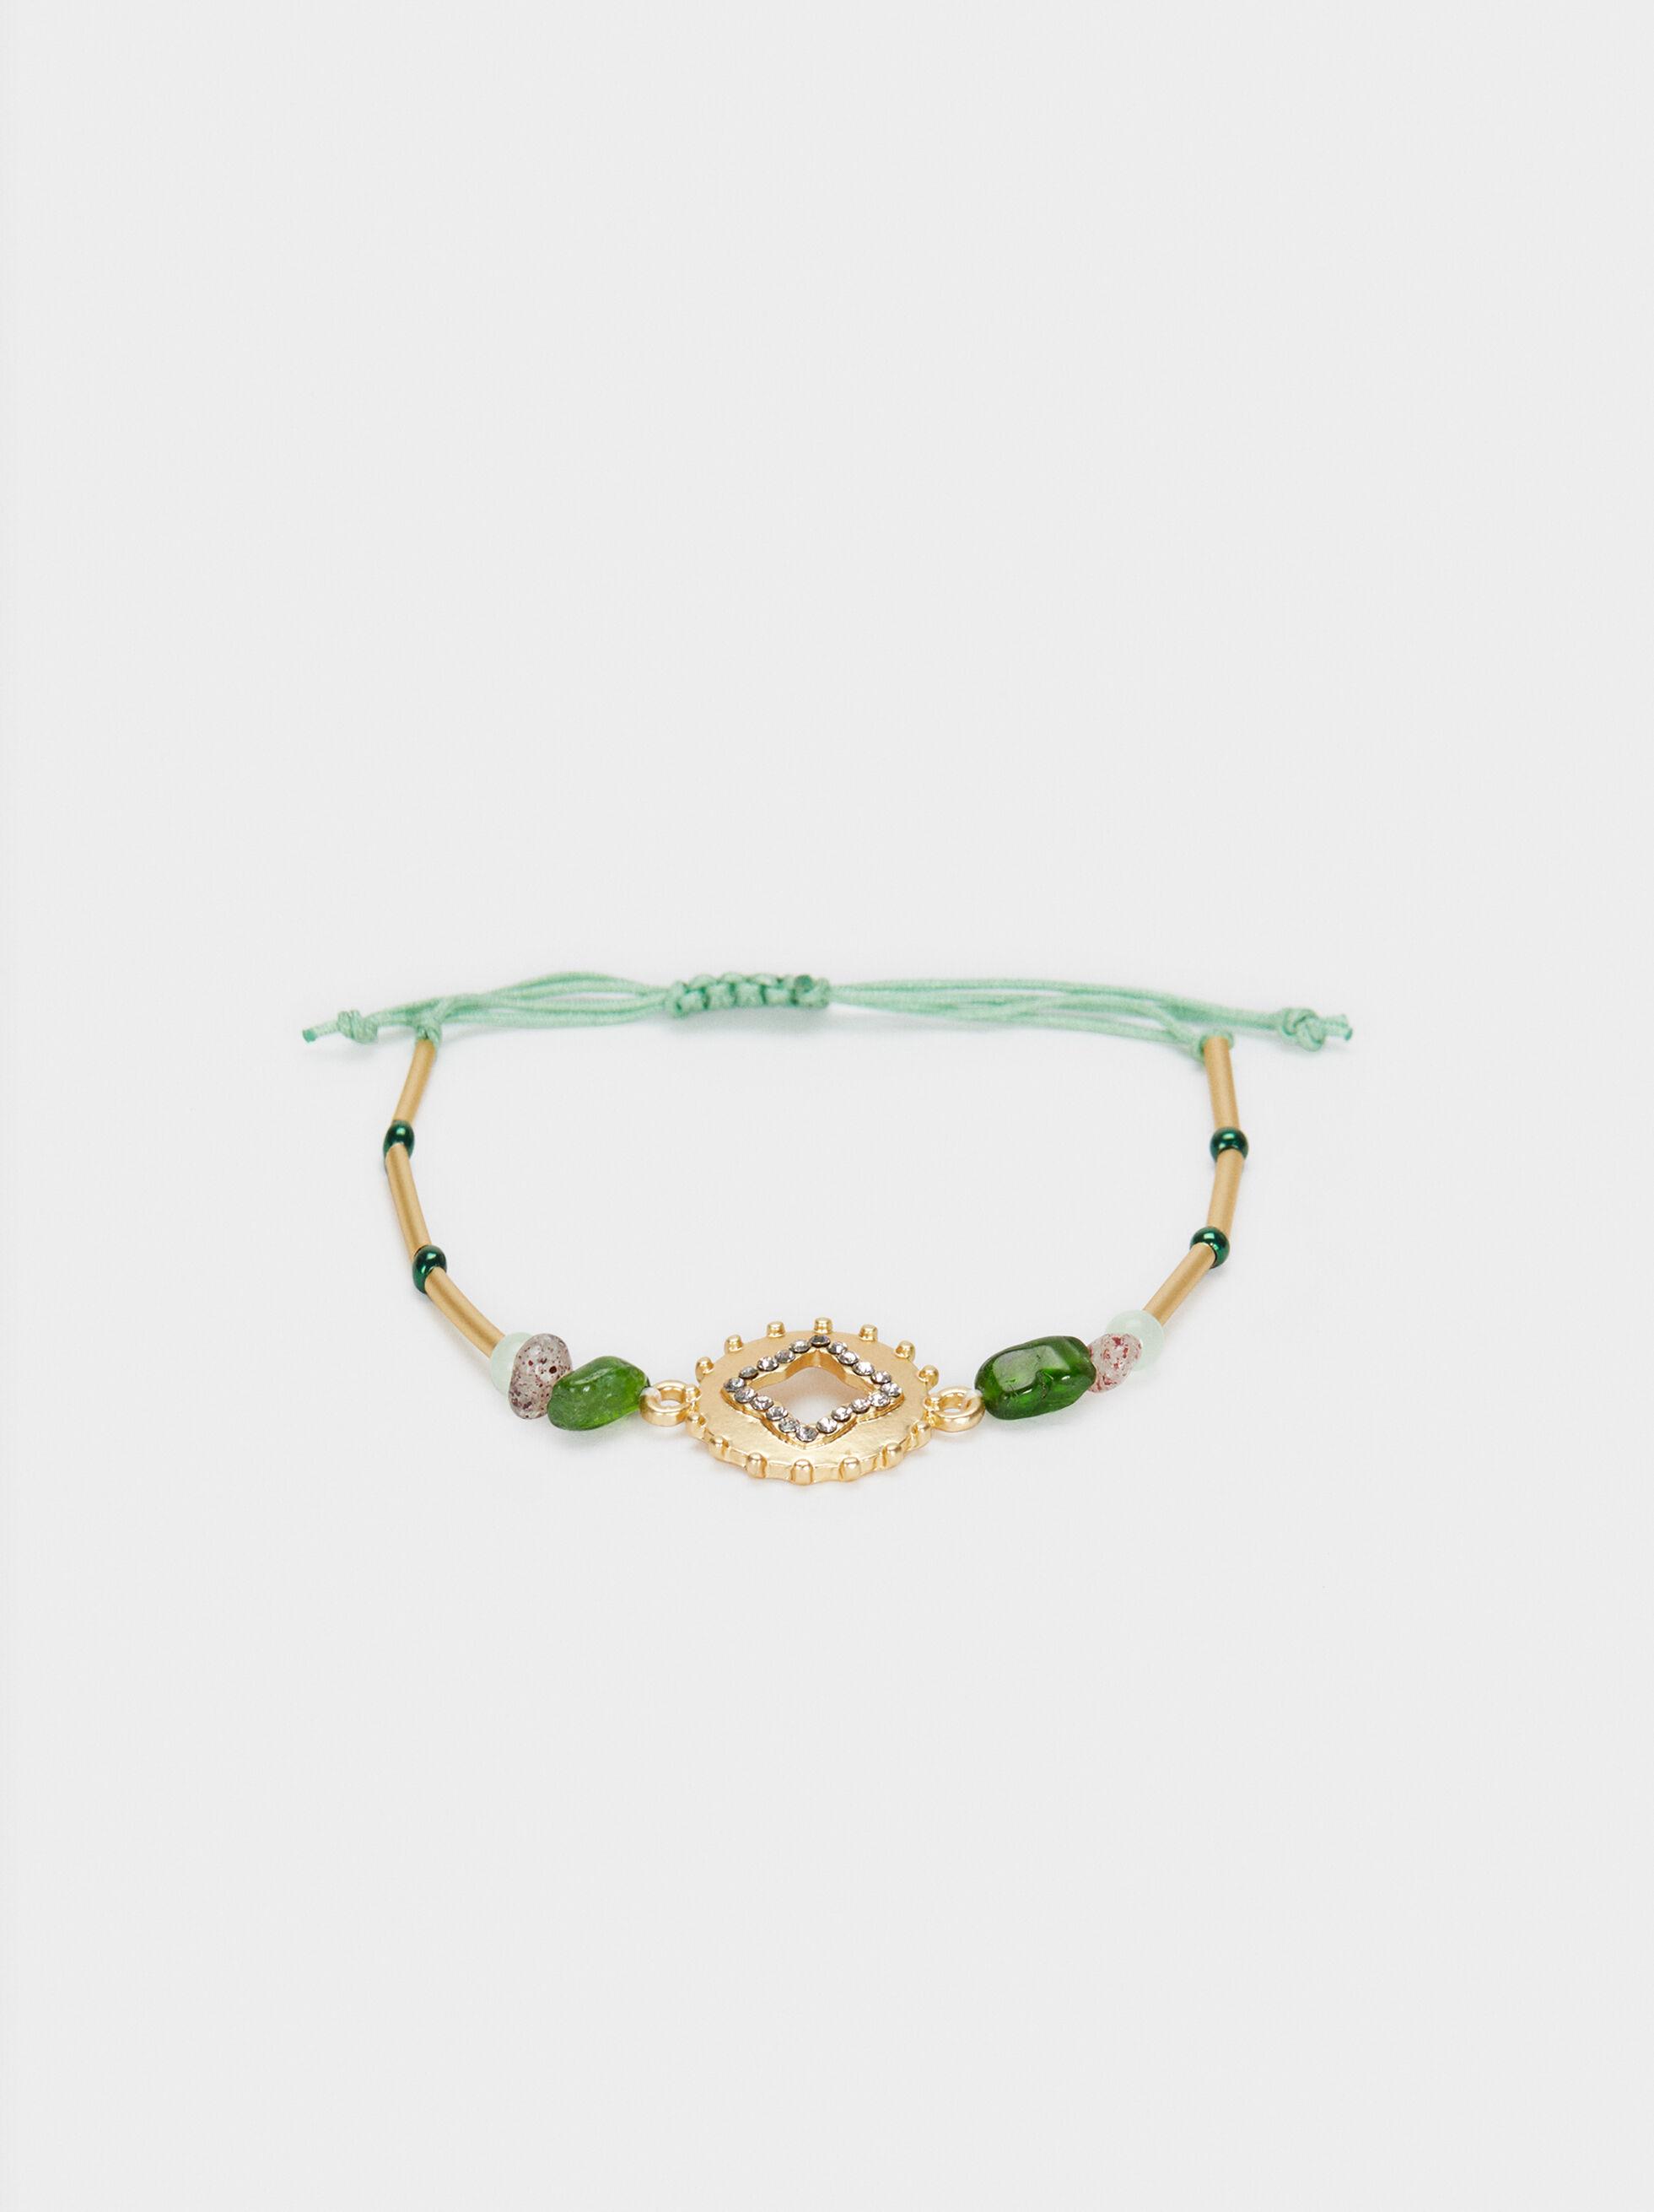 Adjustable Gold Bracelet With Stones, Multicolor, hi-res